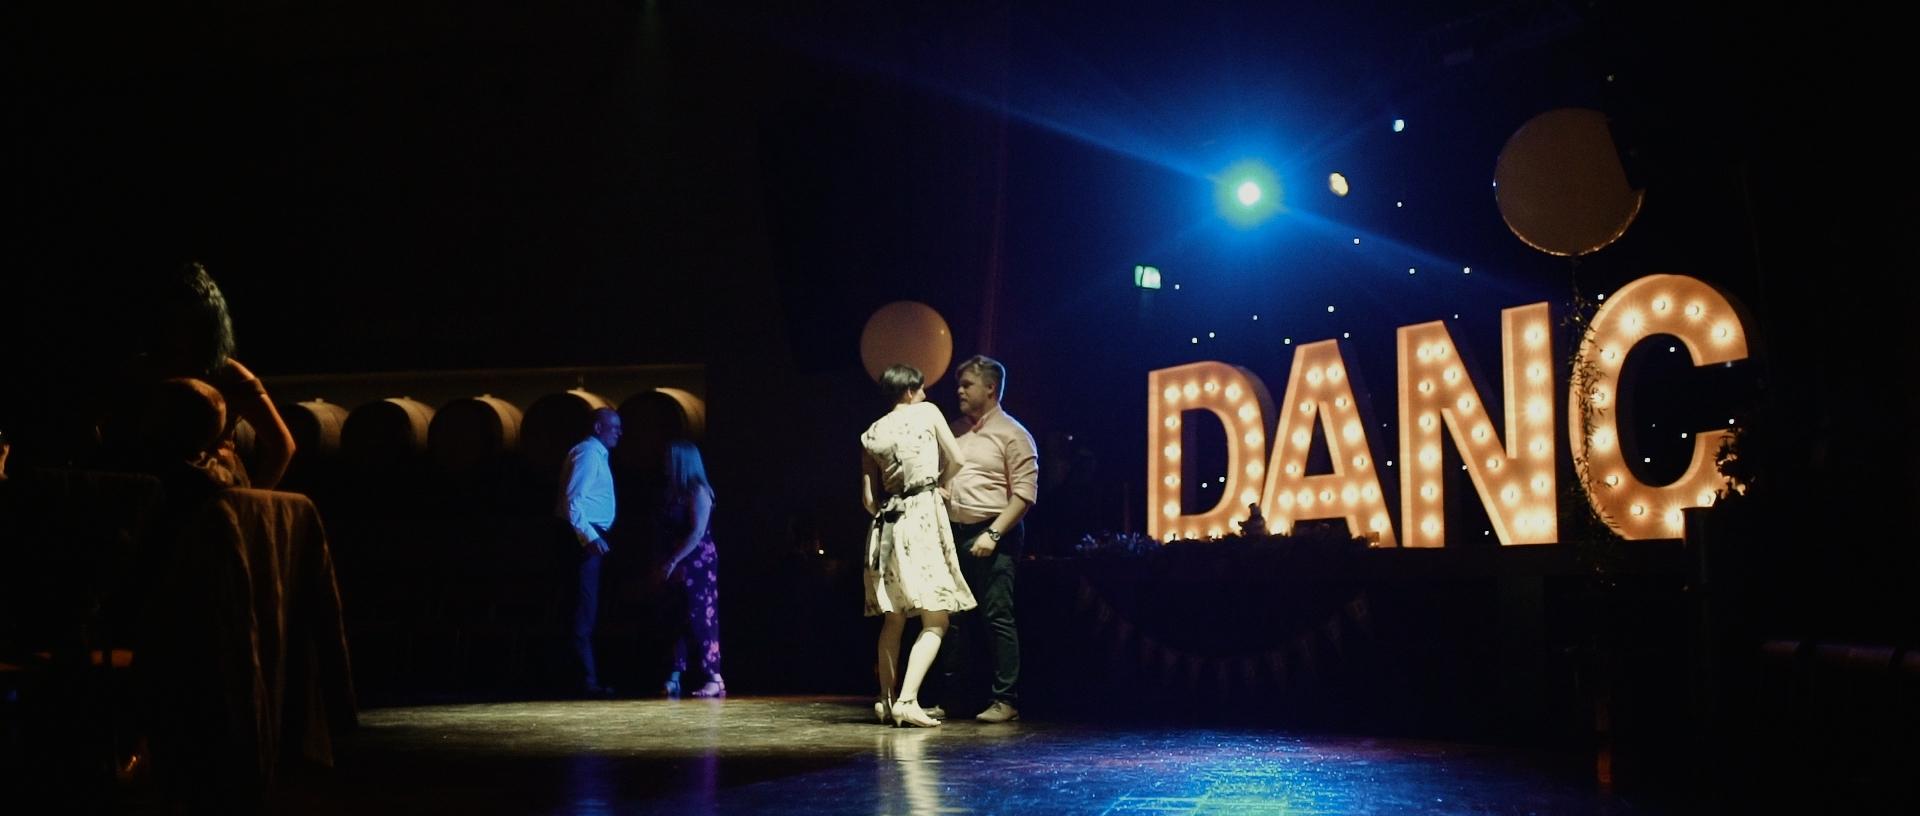 wedding+videography+cinematography+wylambrewery+brewerywedding+newcastle